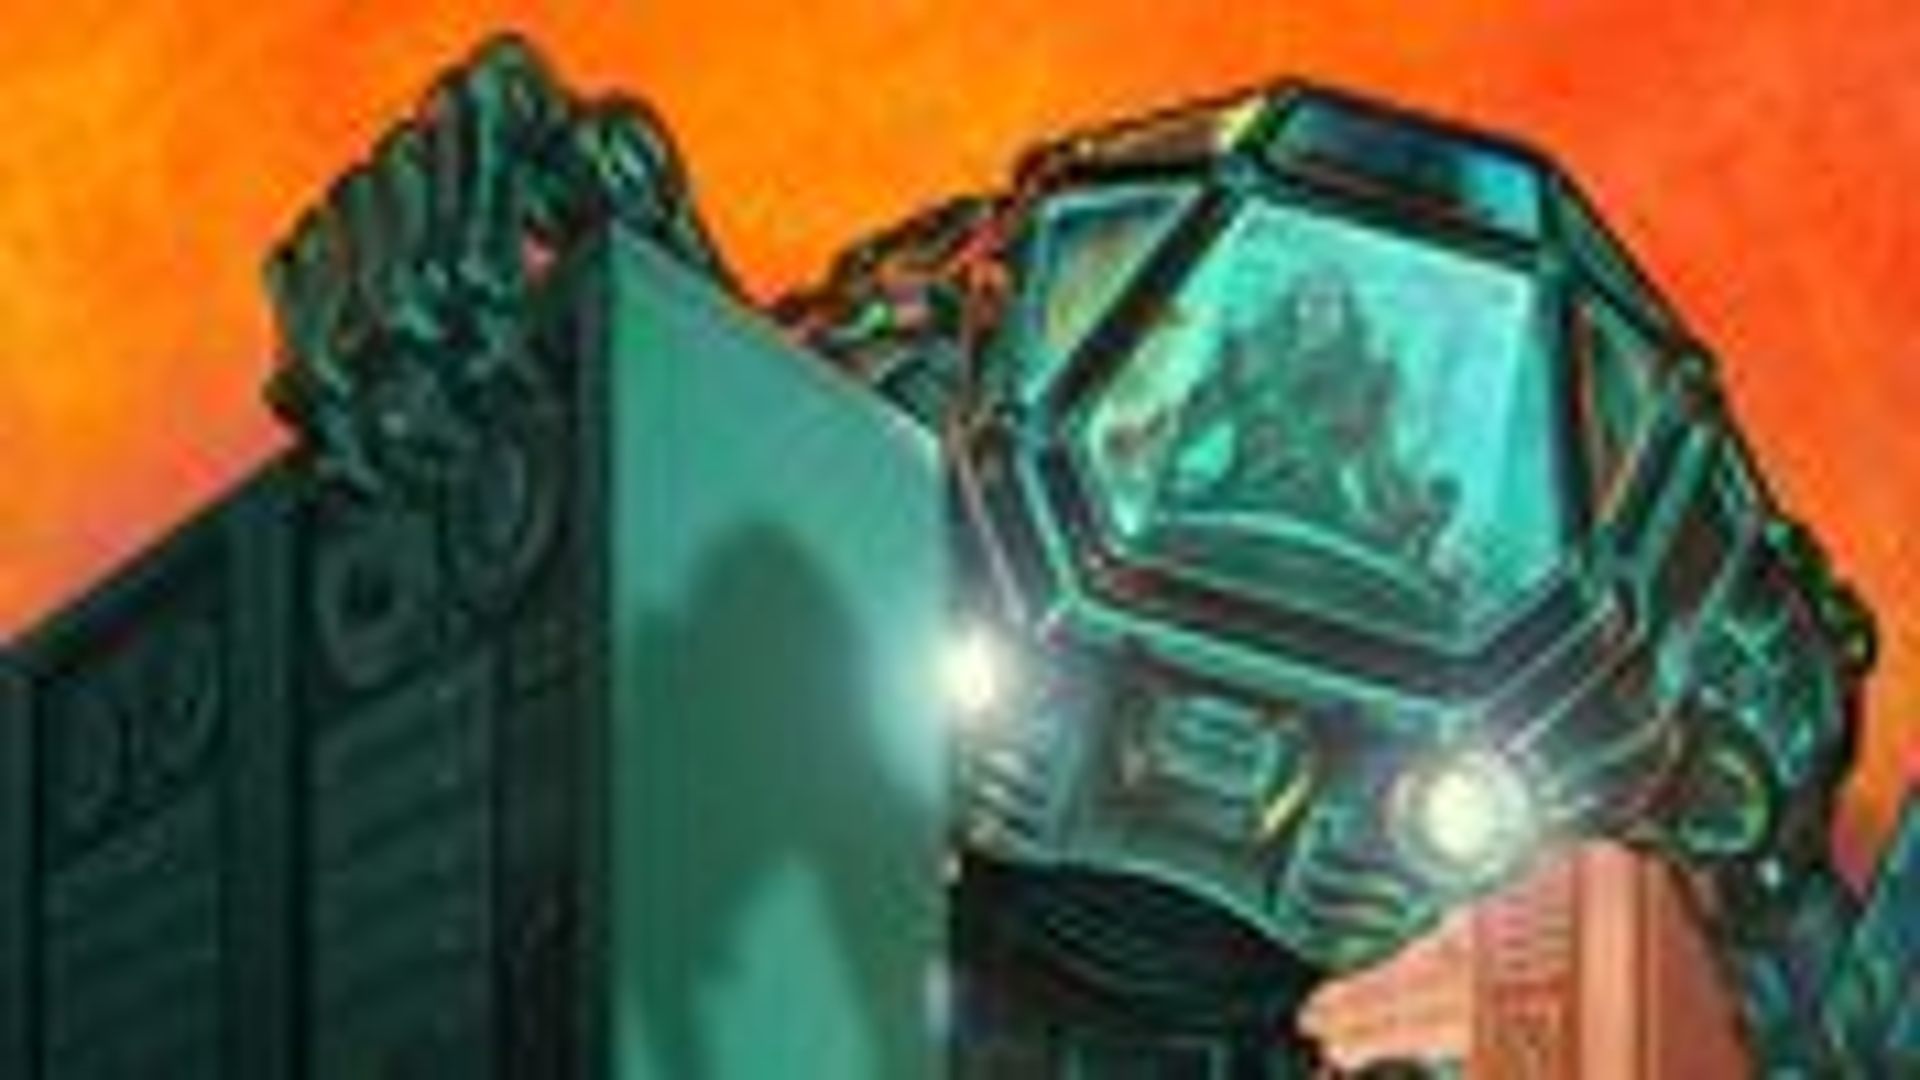 Image for Too Many Bones studio's next board game is co-op robot heist Burncycle